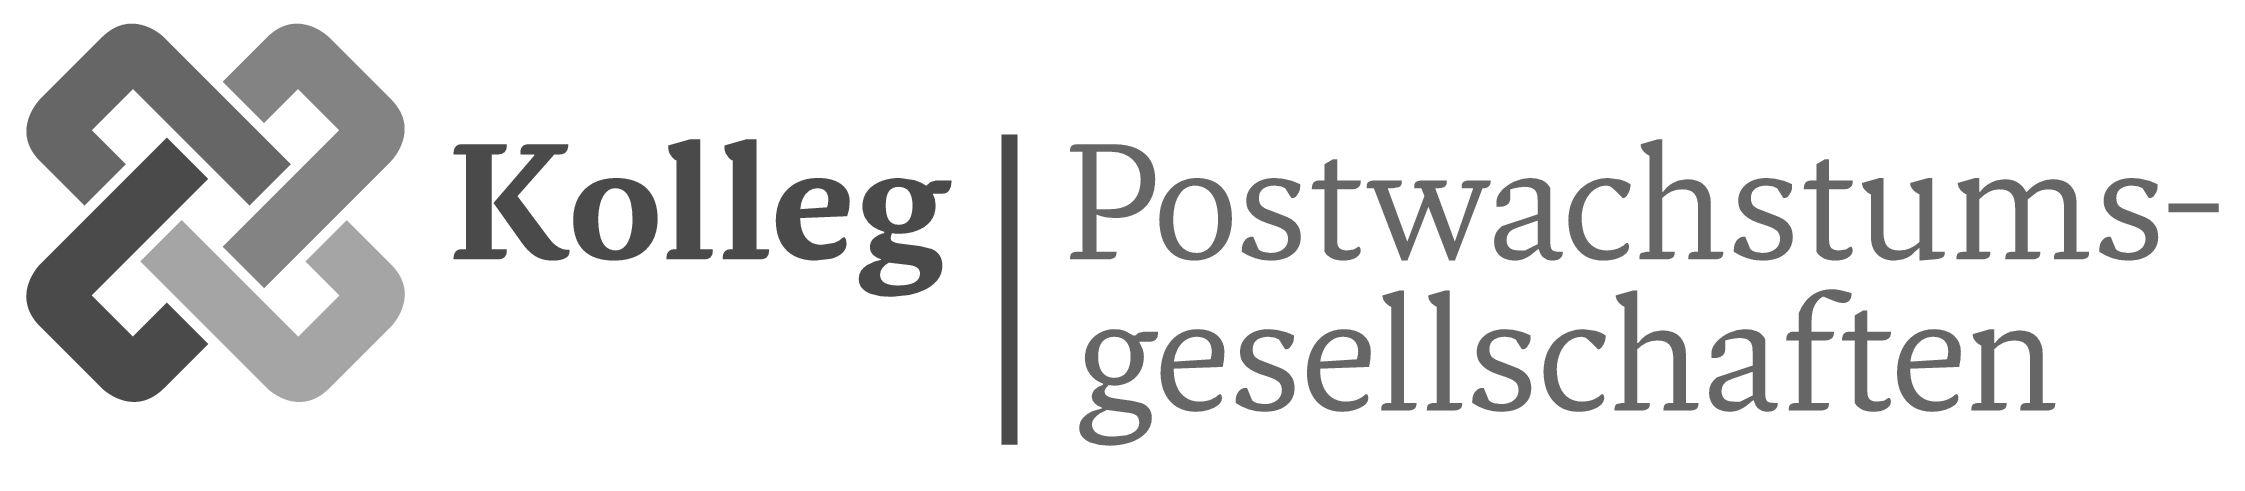 logoKolleg-lang-grau